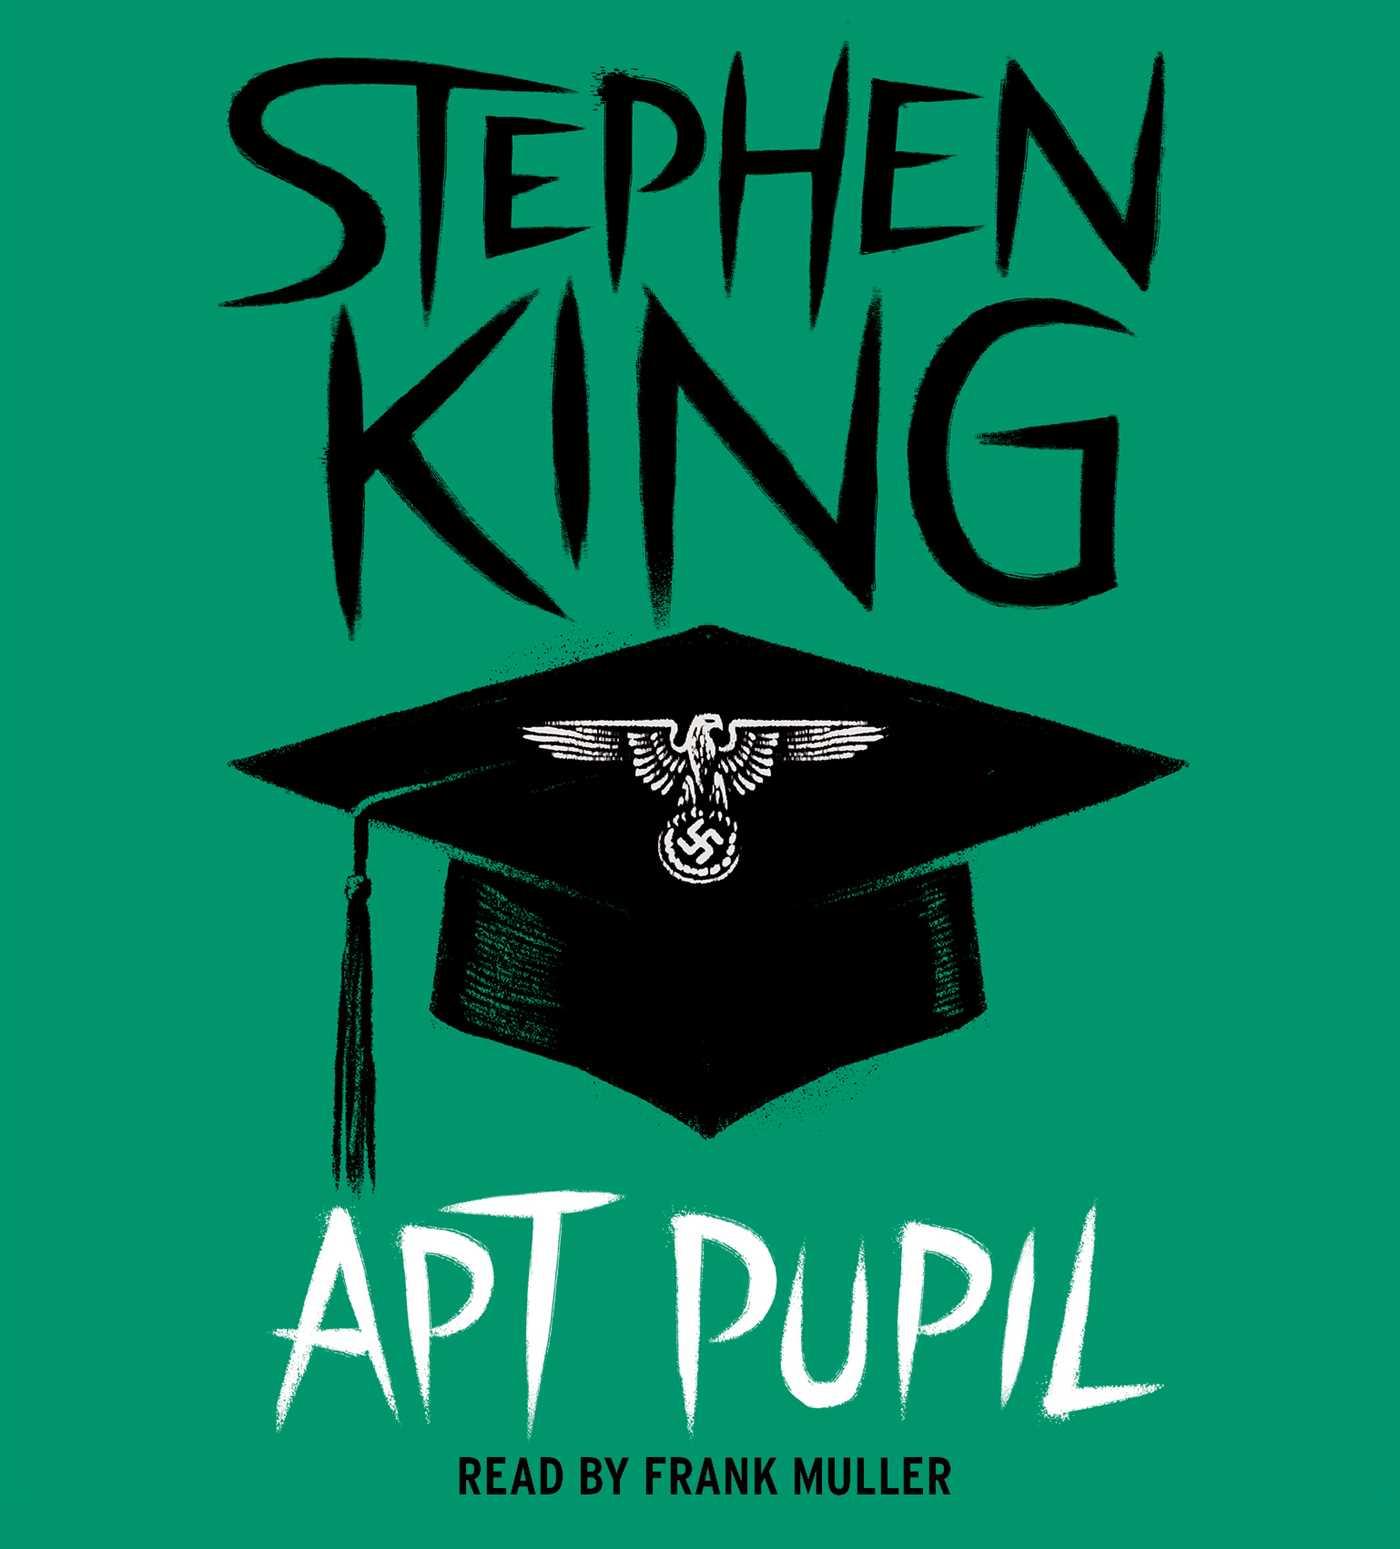 Apt pupil 9781508218548 hr